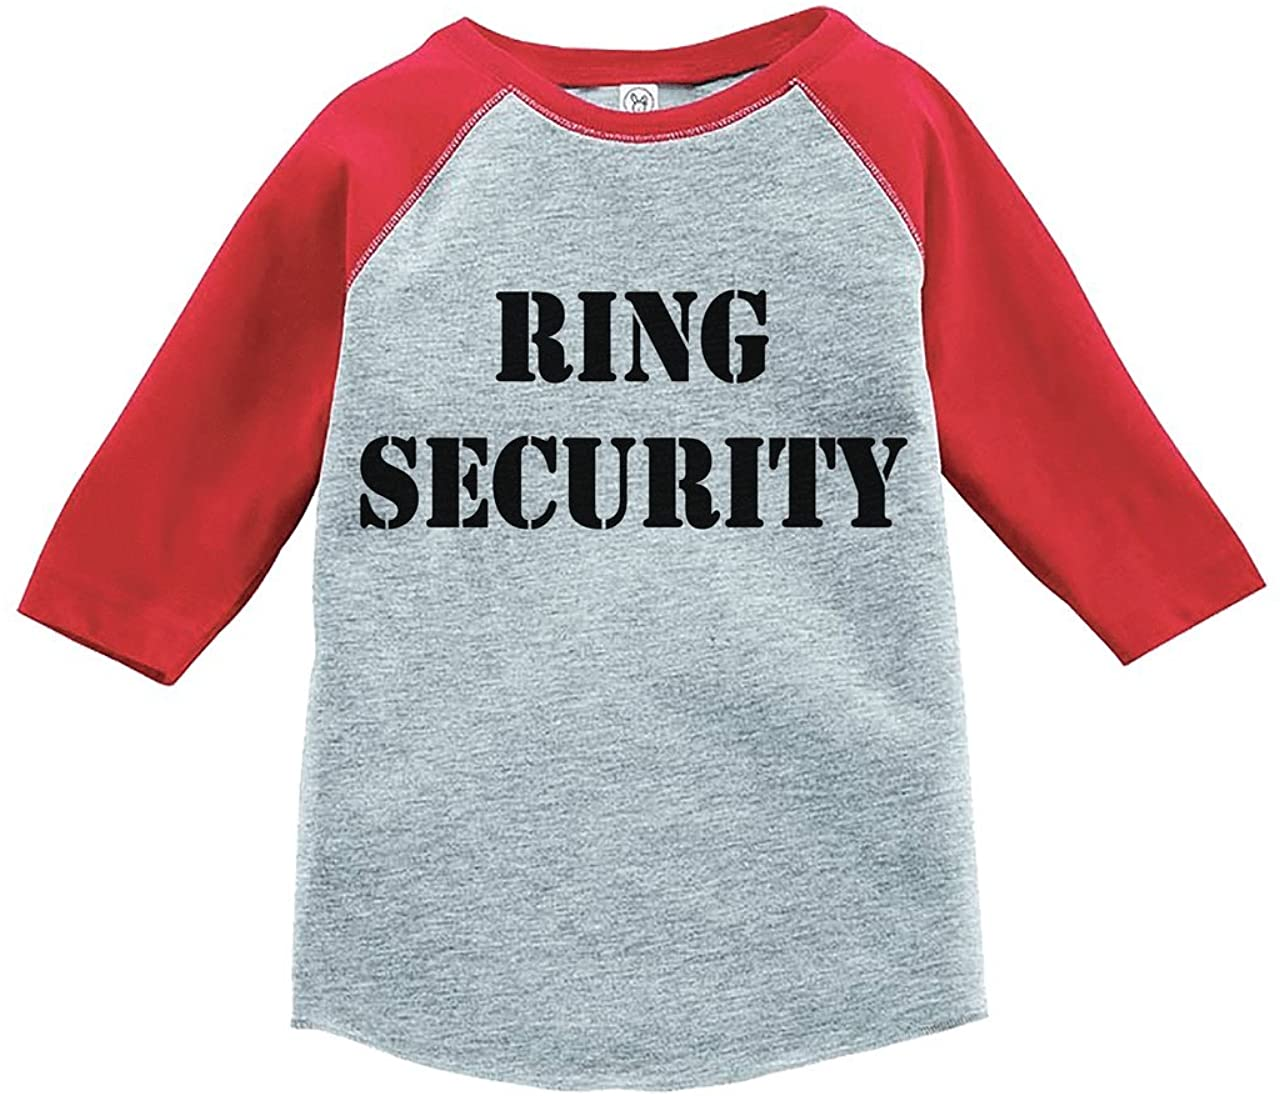 Custom Party Shop Toddler Boys Ring Security Wedding Red Raglan